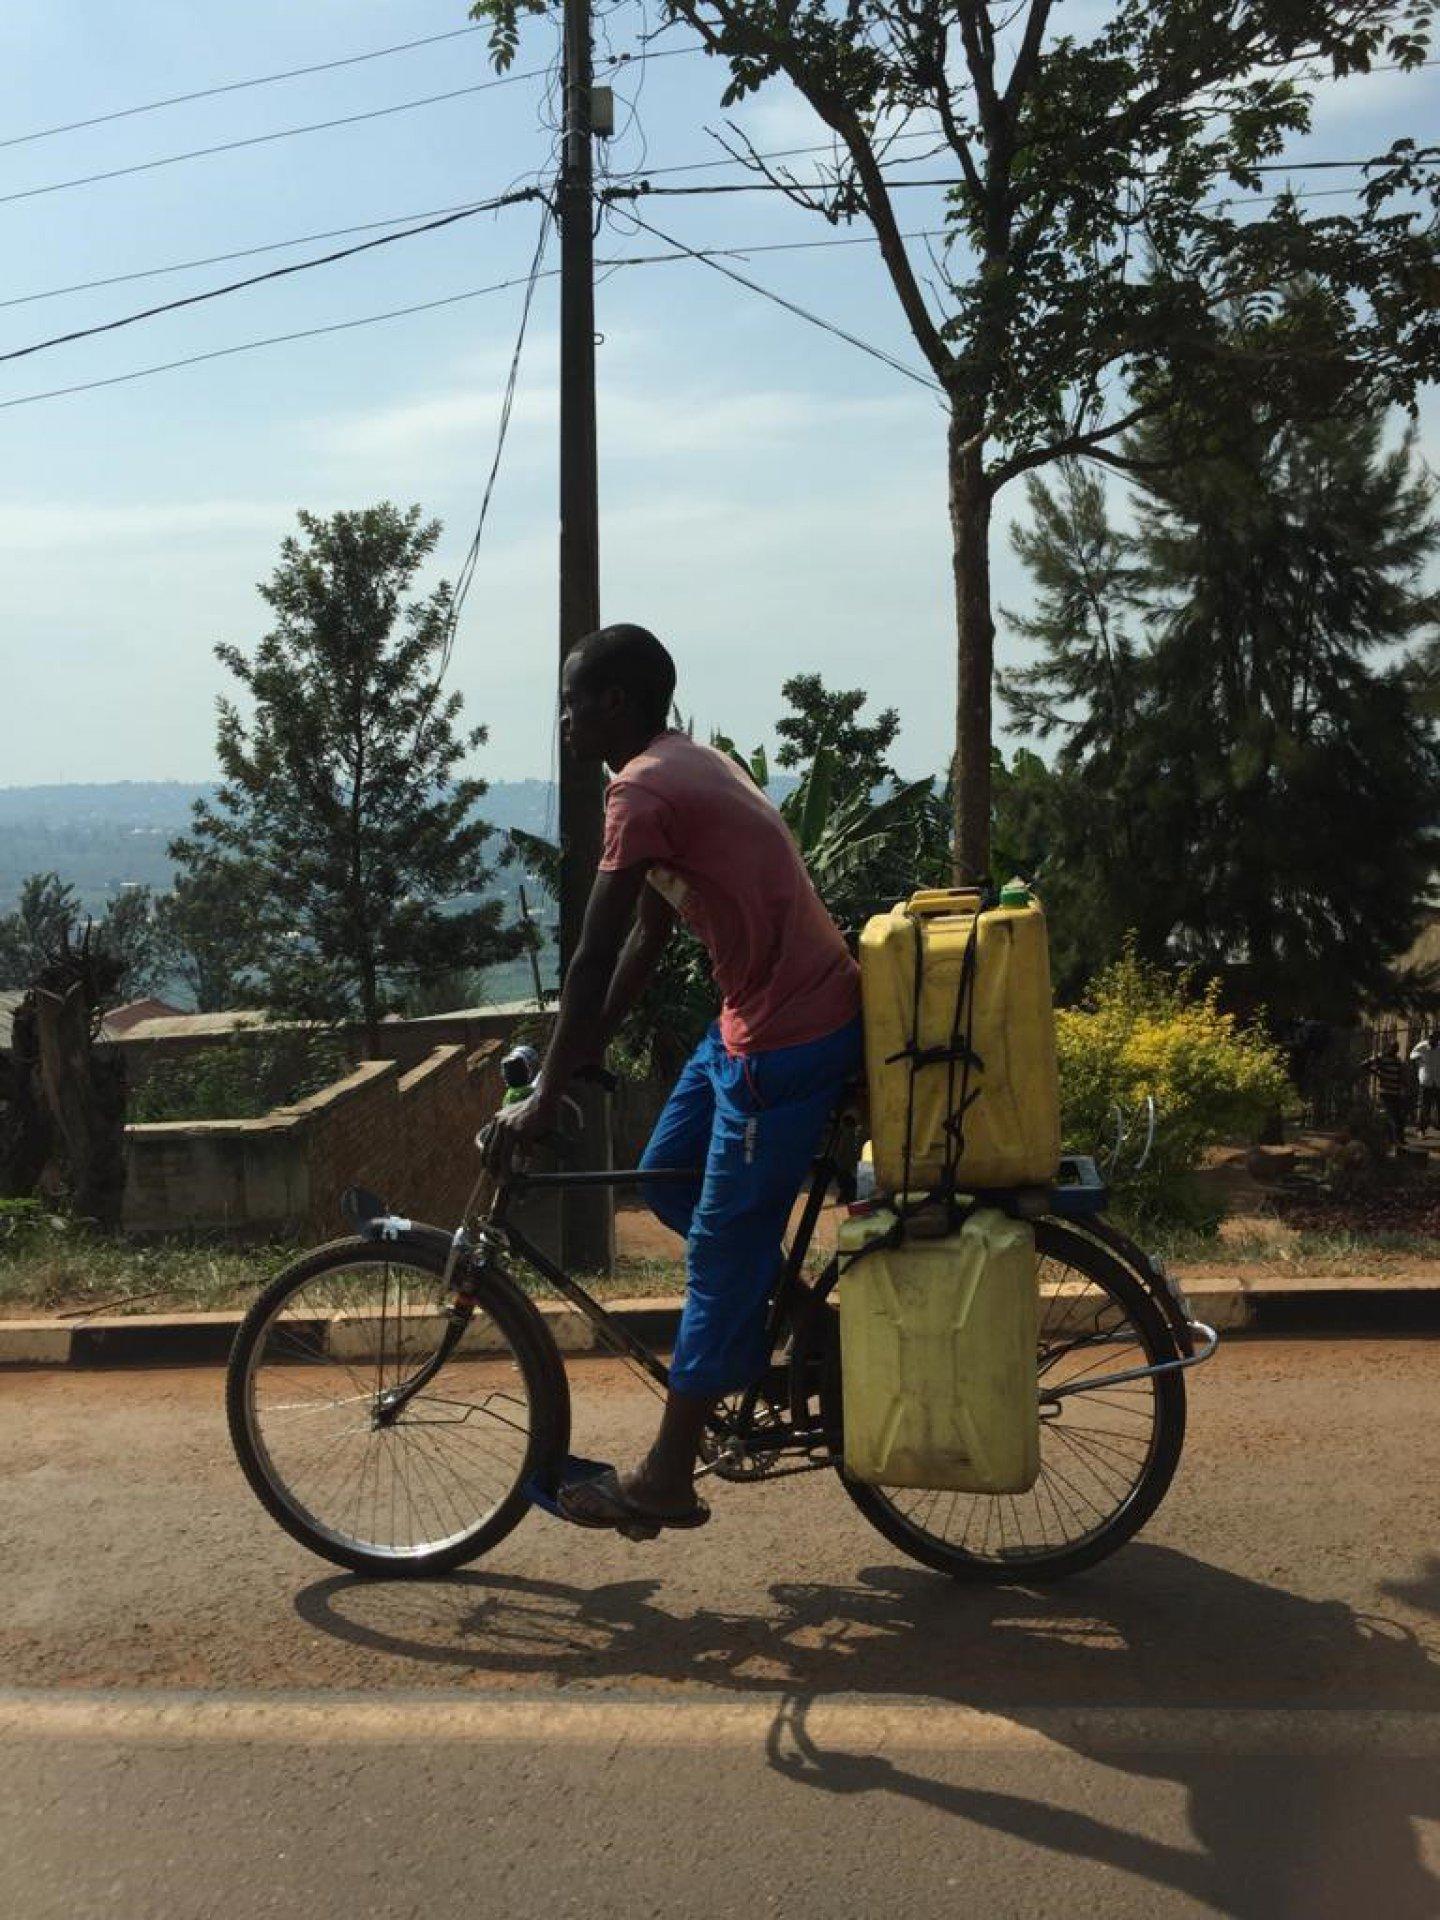 https://www.waterforlife.nl/files/visuals/_1920x1920_fit_center-center_85_none/fiets-Rwanda.jpg